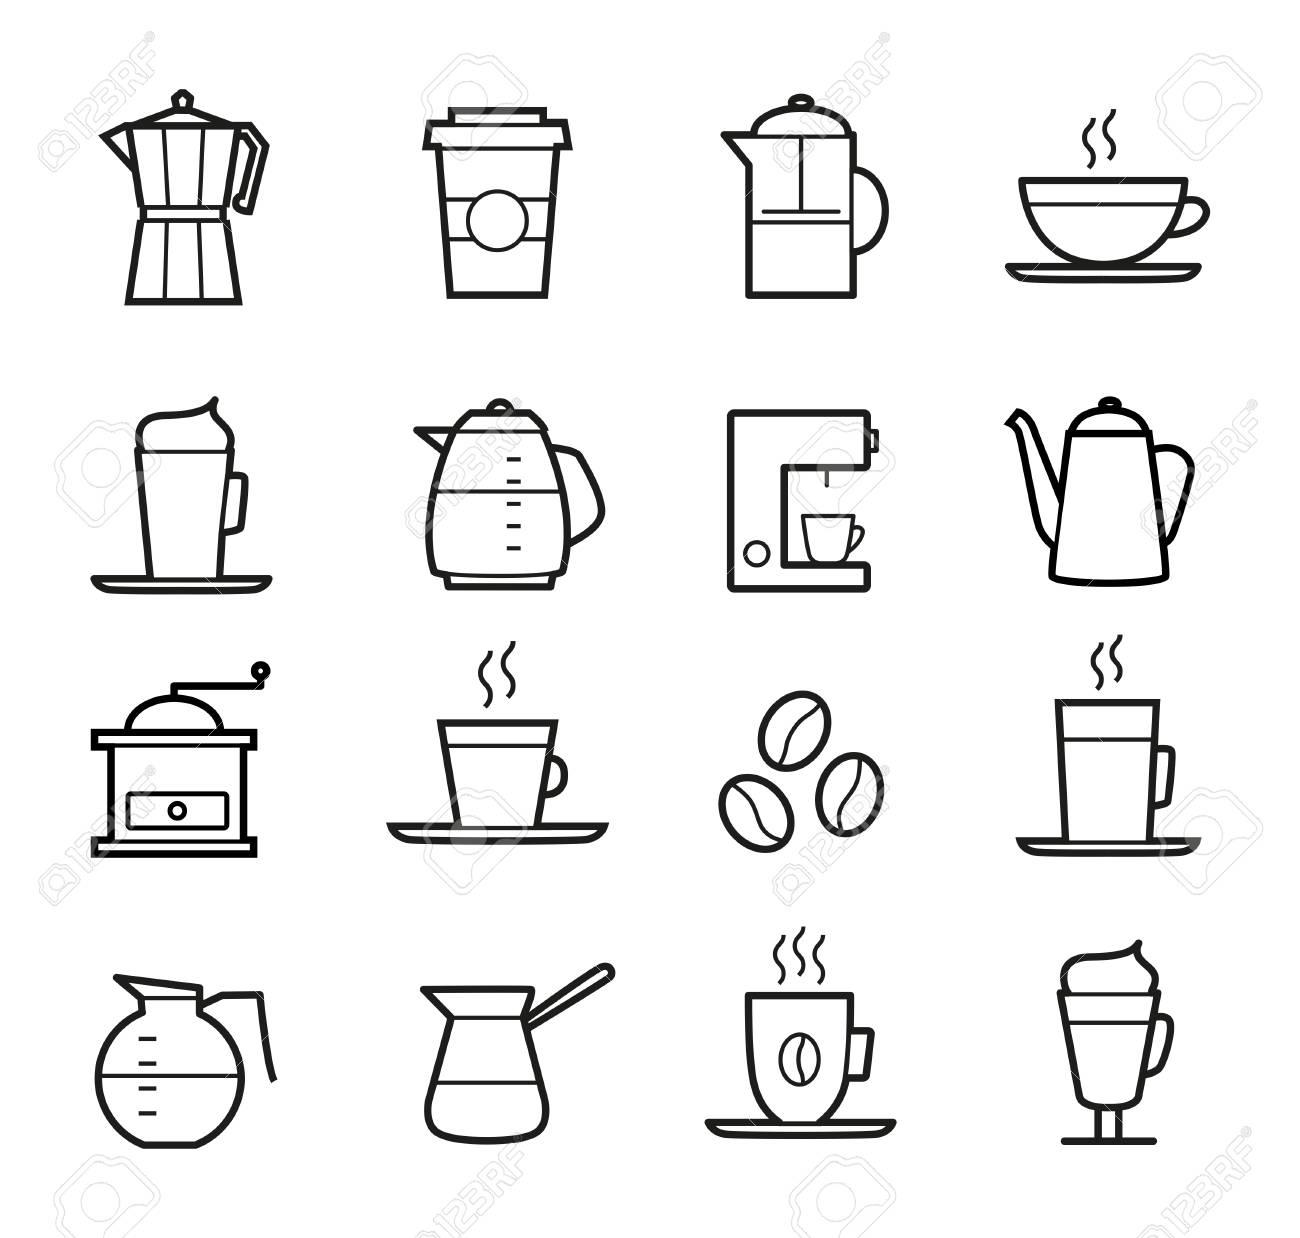 Coffee icons set - thin line design. Coffee cups, pots, coffee machines. - 50372209